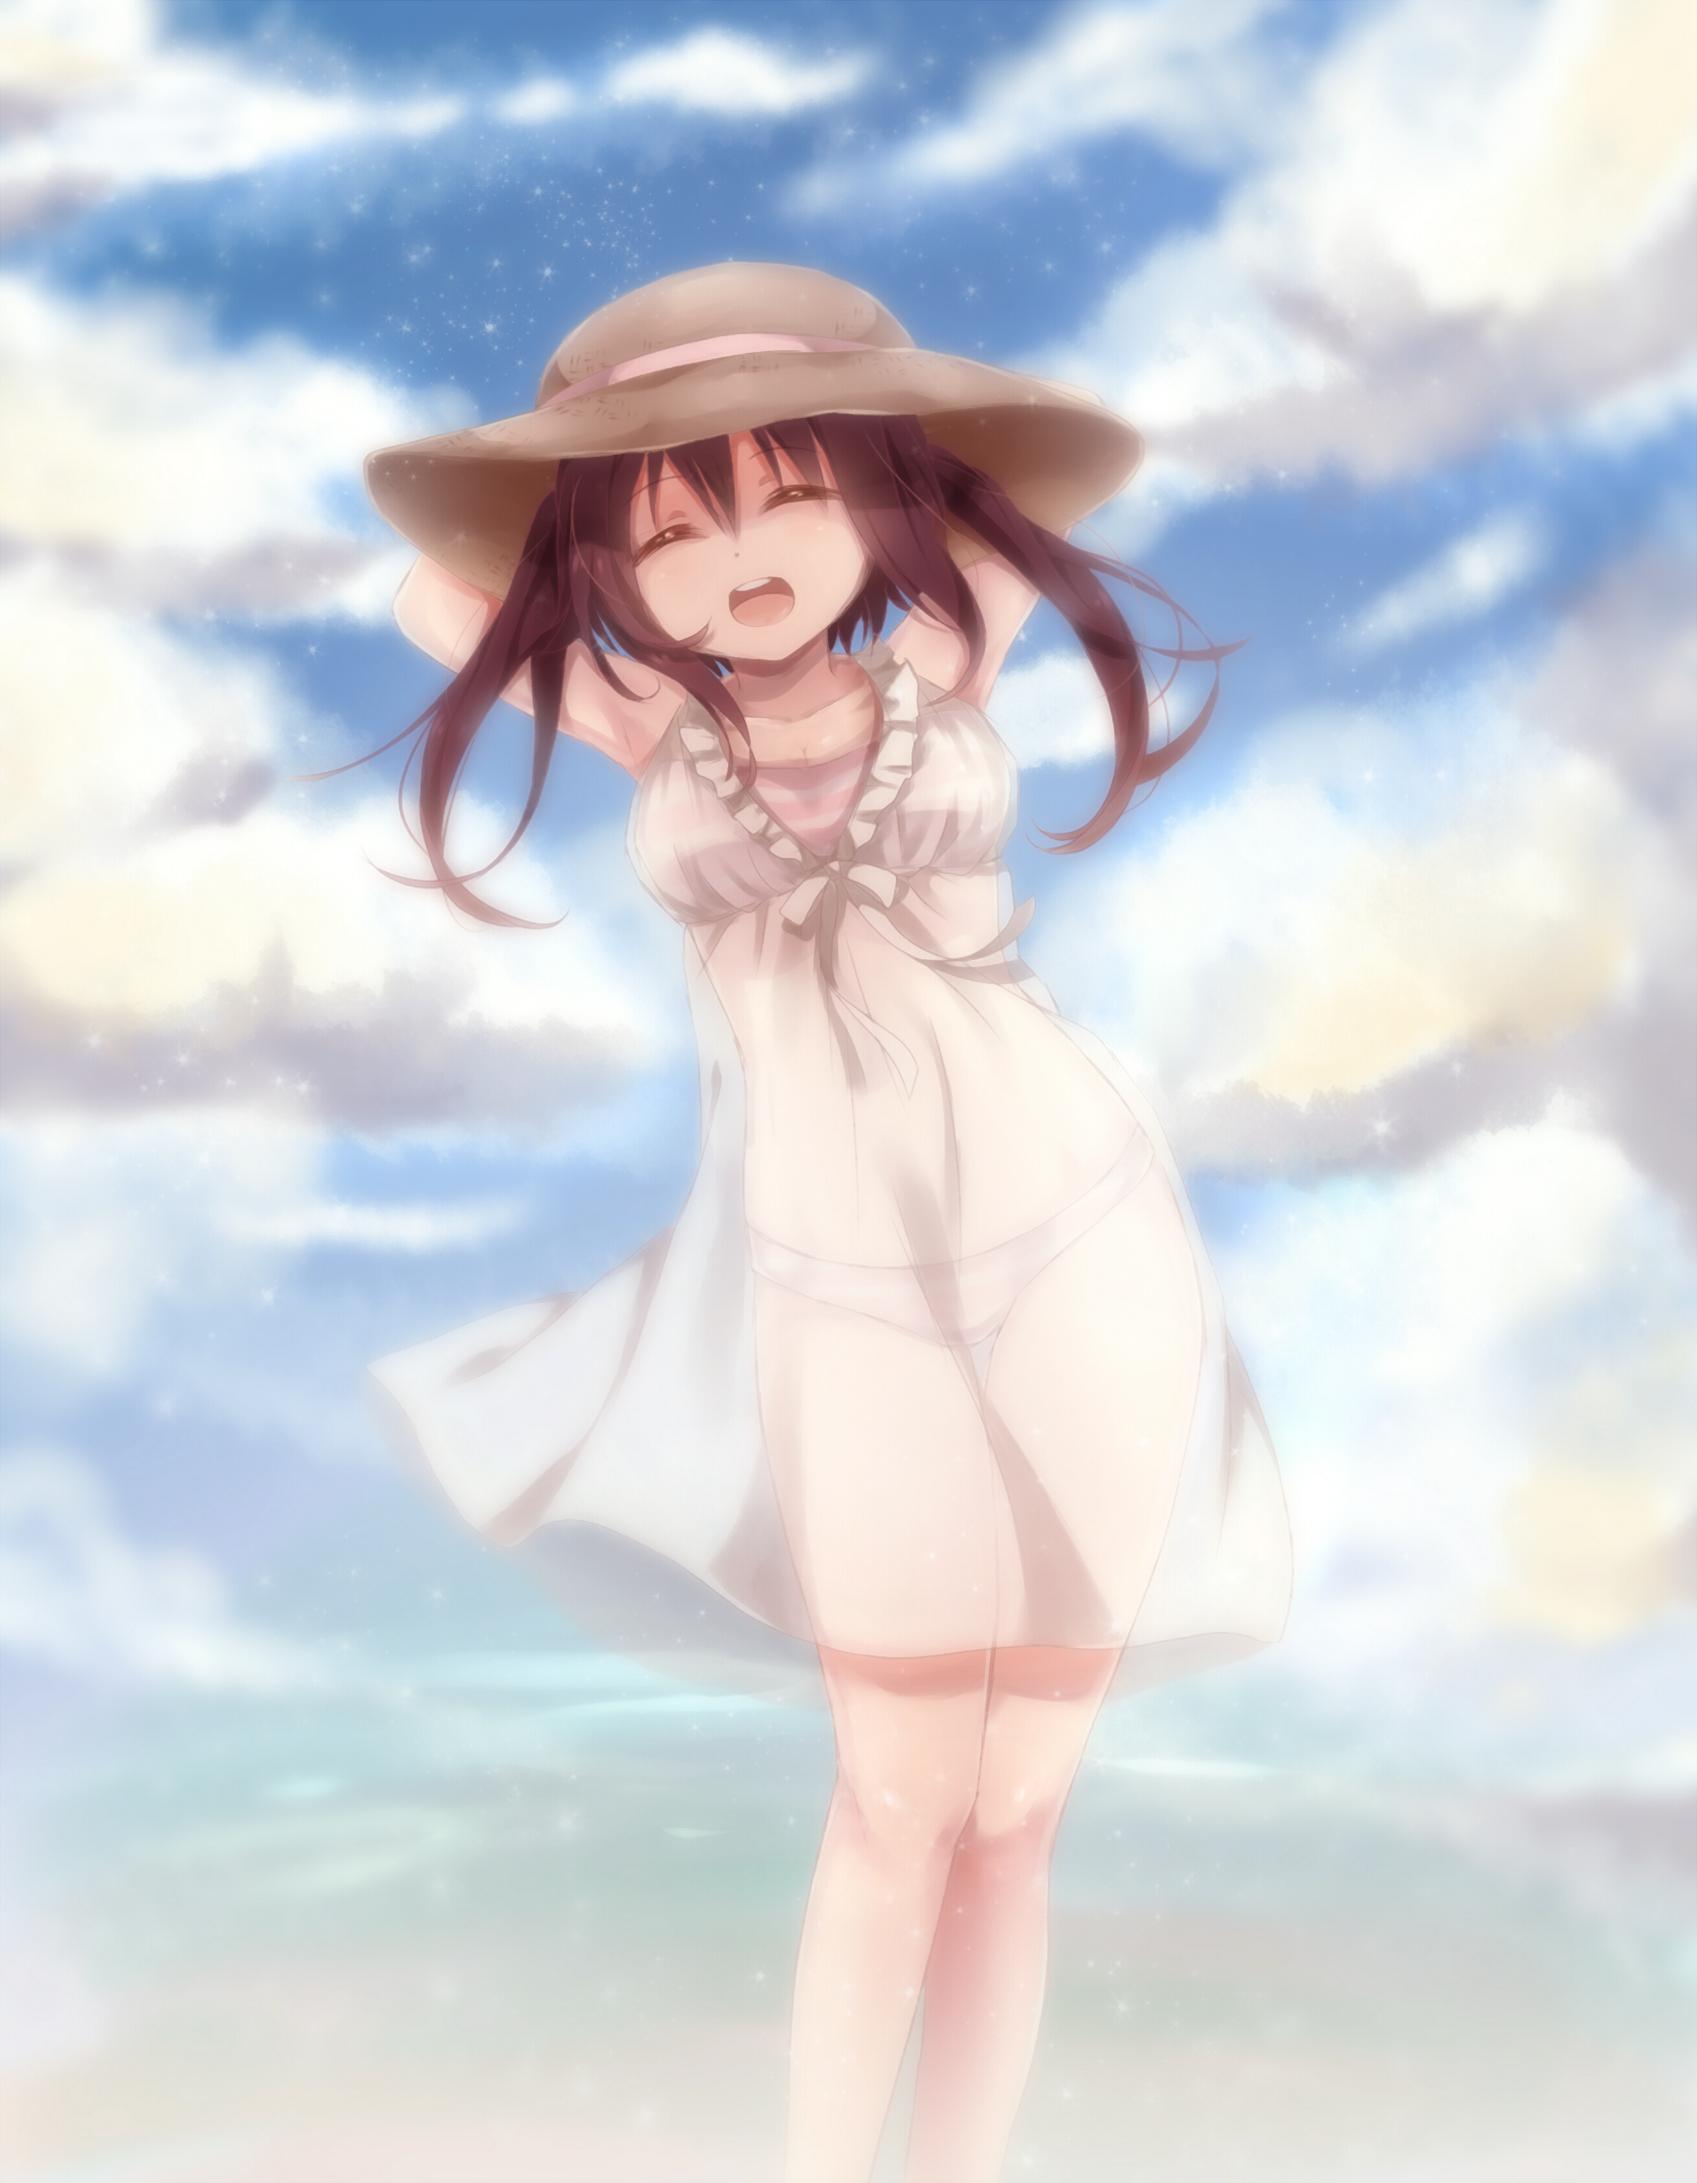 Wallpaper Himouto Umaru Chan Anime Girls Nana Ebina 1697x2183